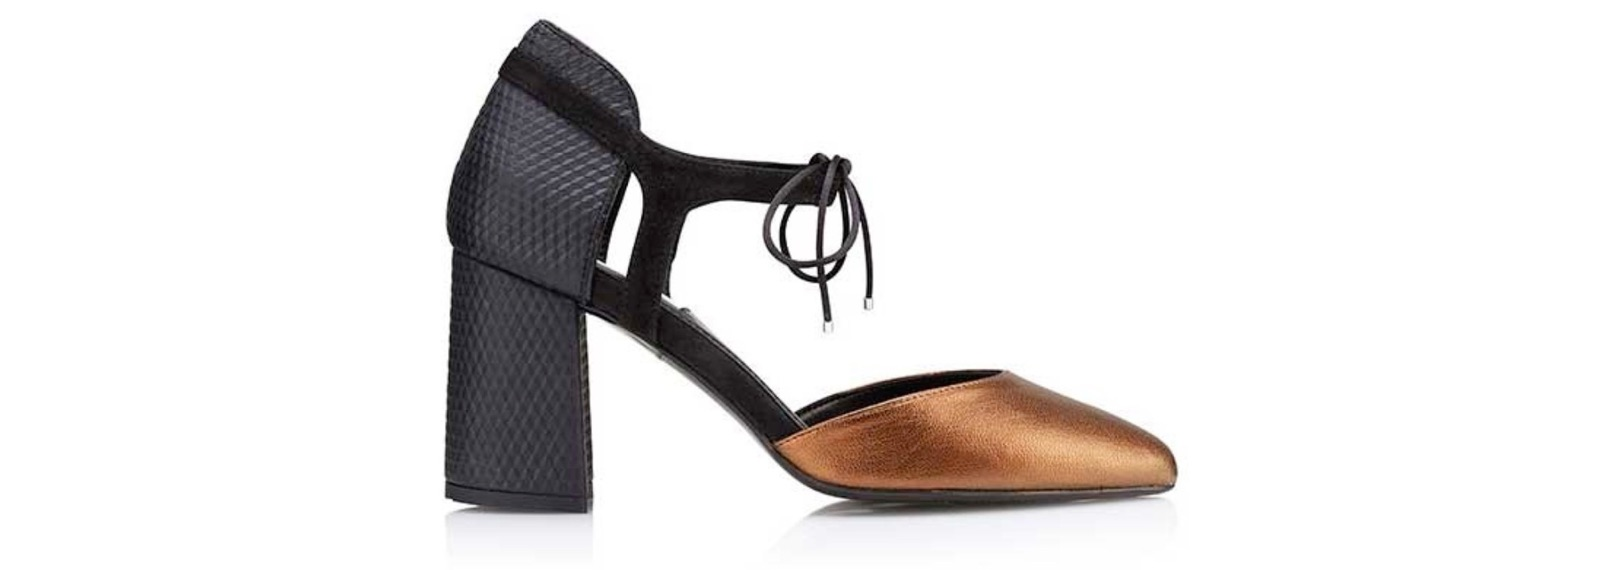 Zapato de tacón medio Rafaela Black - Miss García